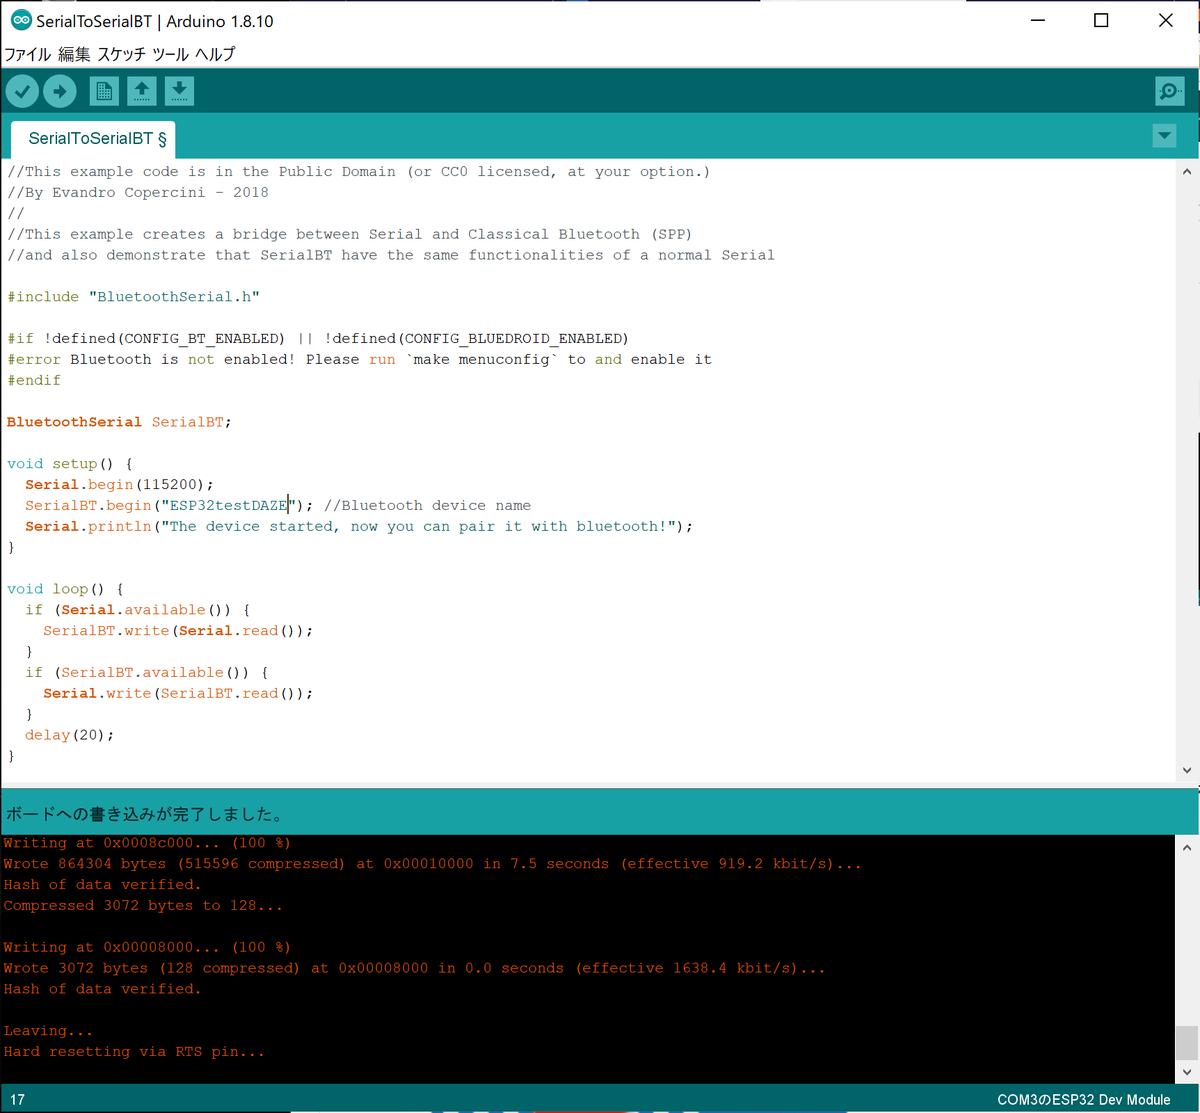 f:id:opensourcetech:20200115221137p:plain